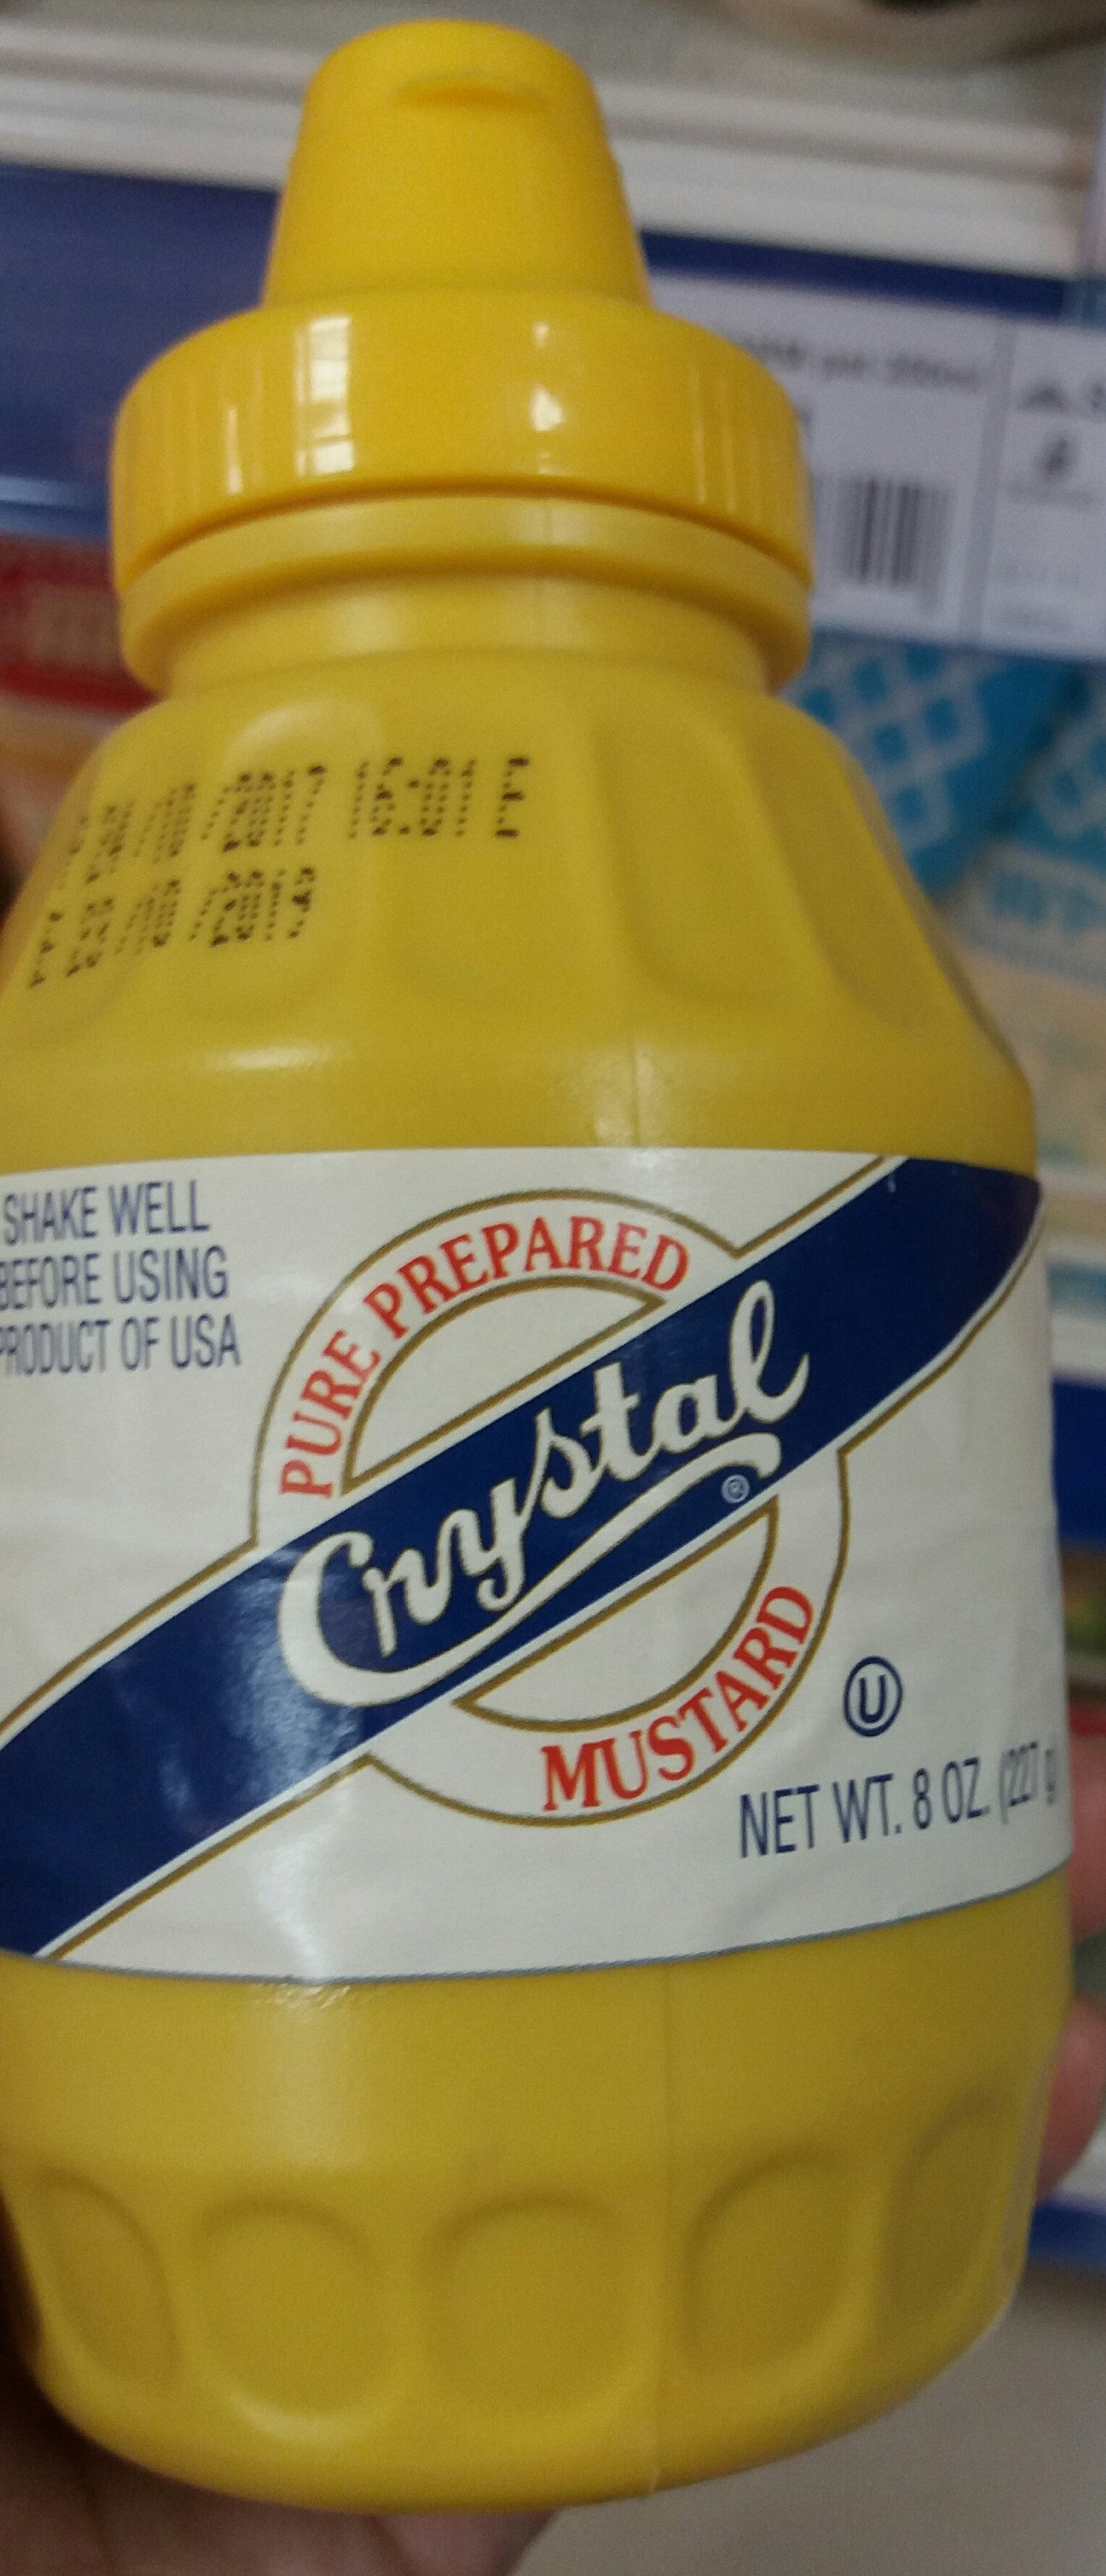 mustard - Sản phẩm